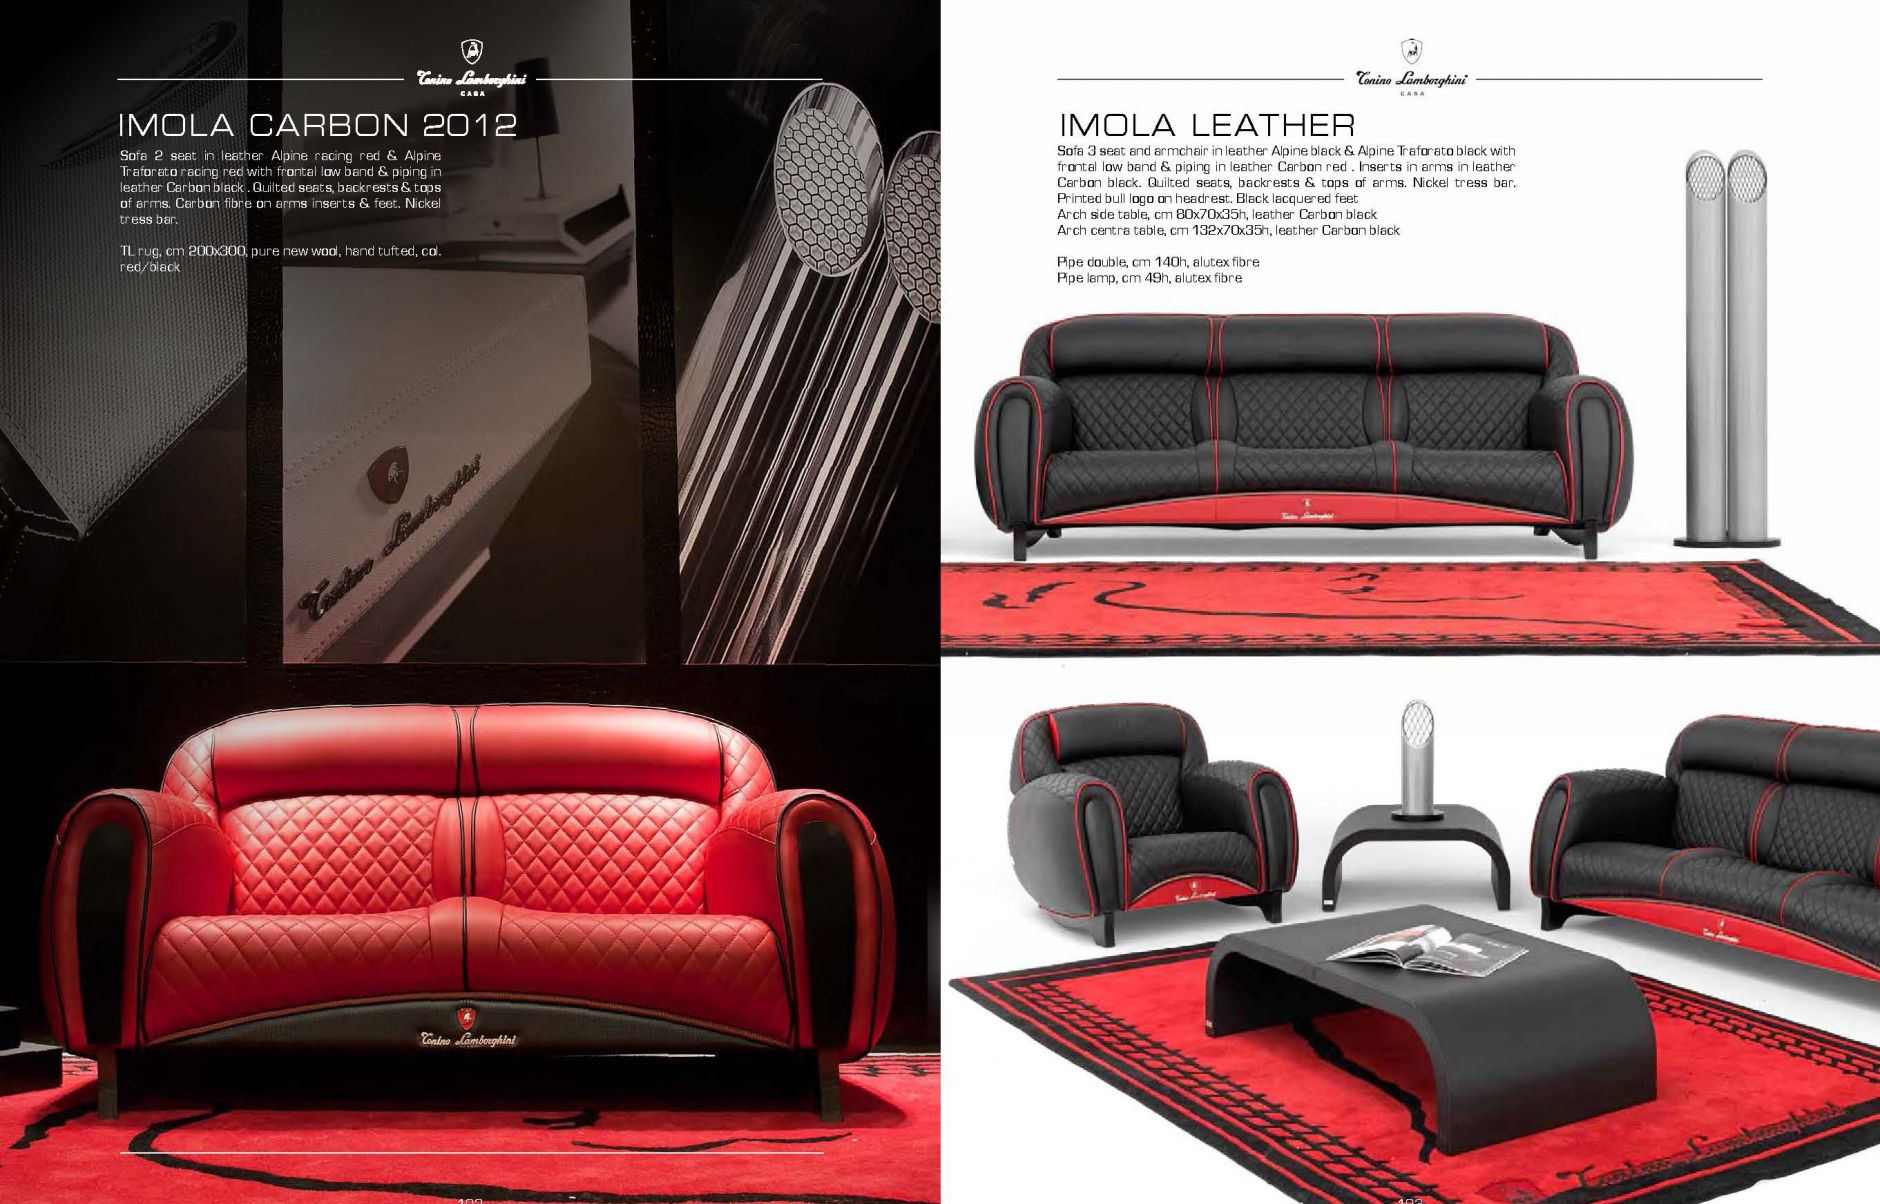 vip sofas luxus m bel serie imola carbondie m bel aus italien. Black Bedroom Furniture Sets. Home Design Ideas